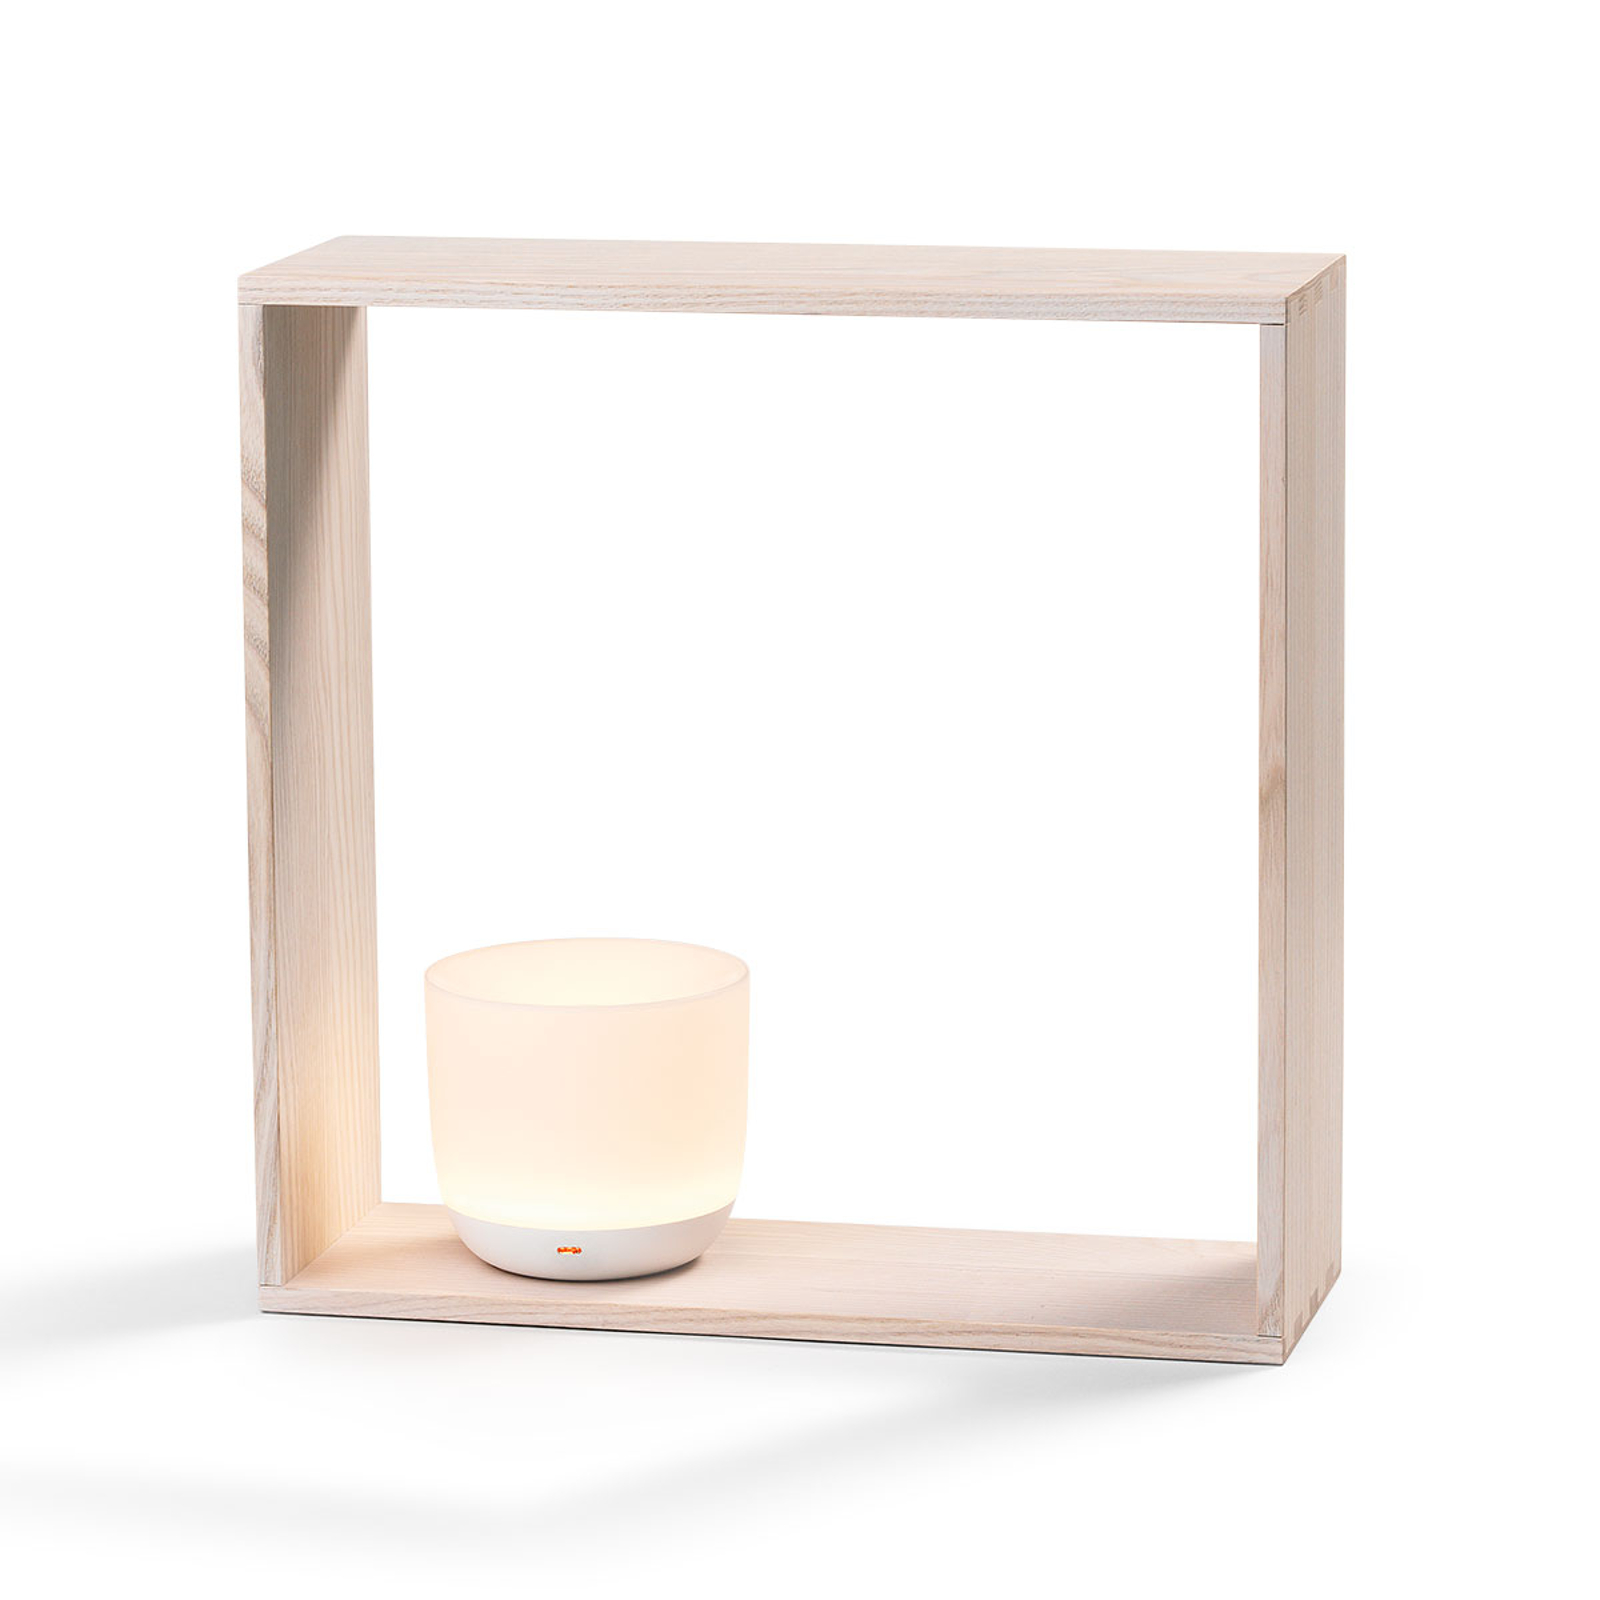 FLOS Gaku Wireless lampe à poser LED, blanche